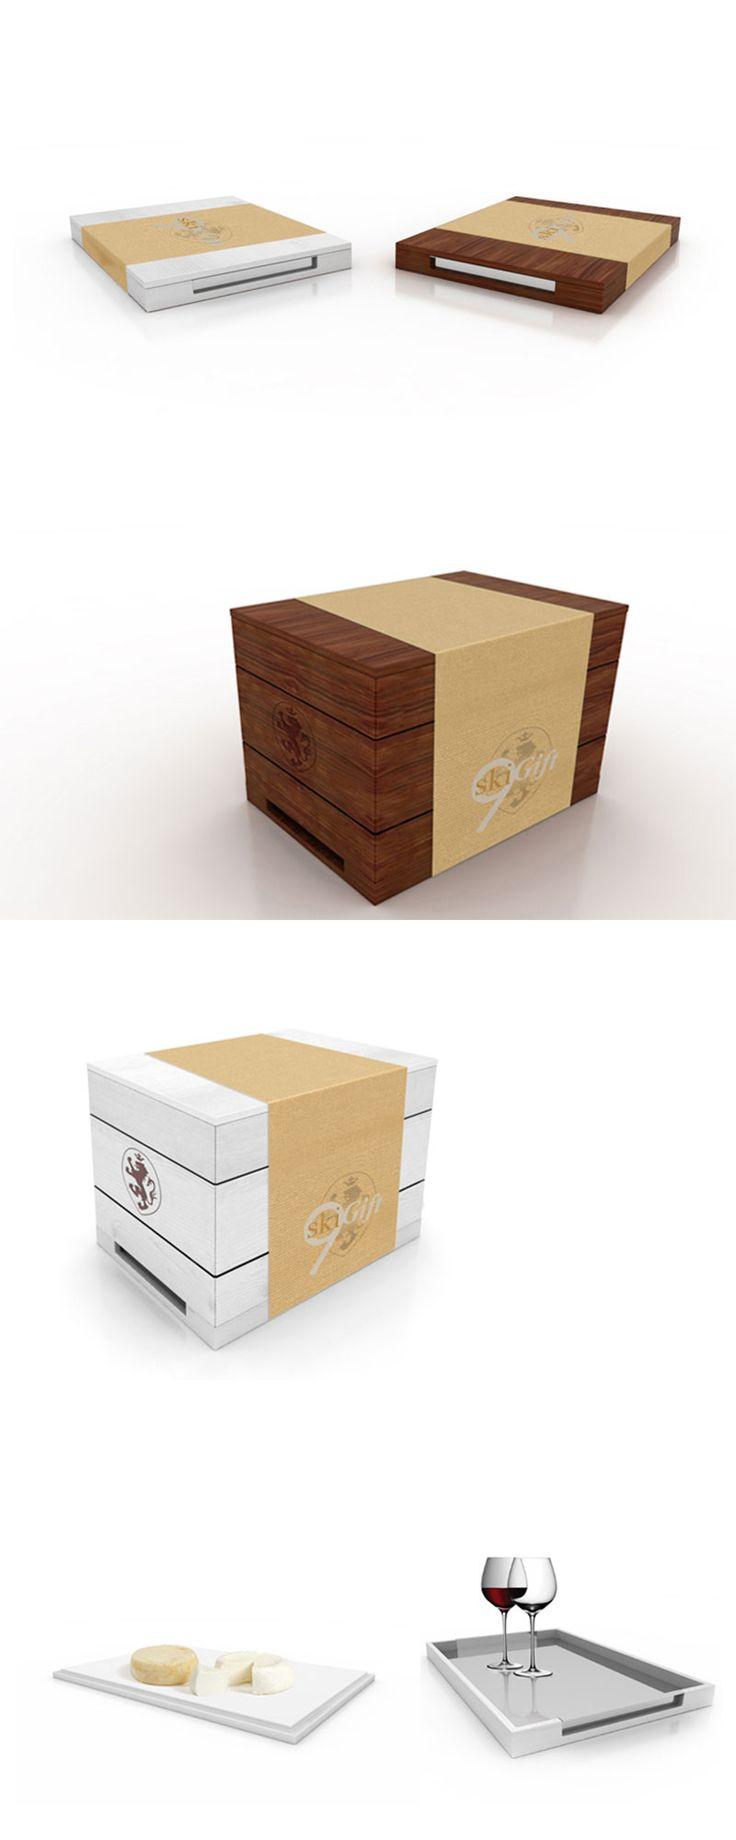 9ski Gift, Packaging Design ─ Giulio Patrizi Design Agency ©   #packaging #coffee #design